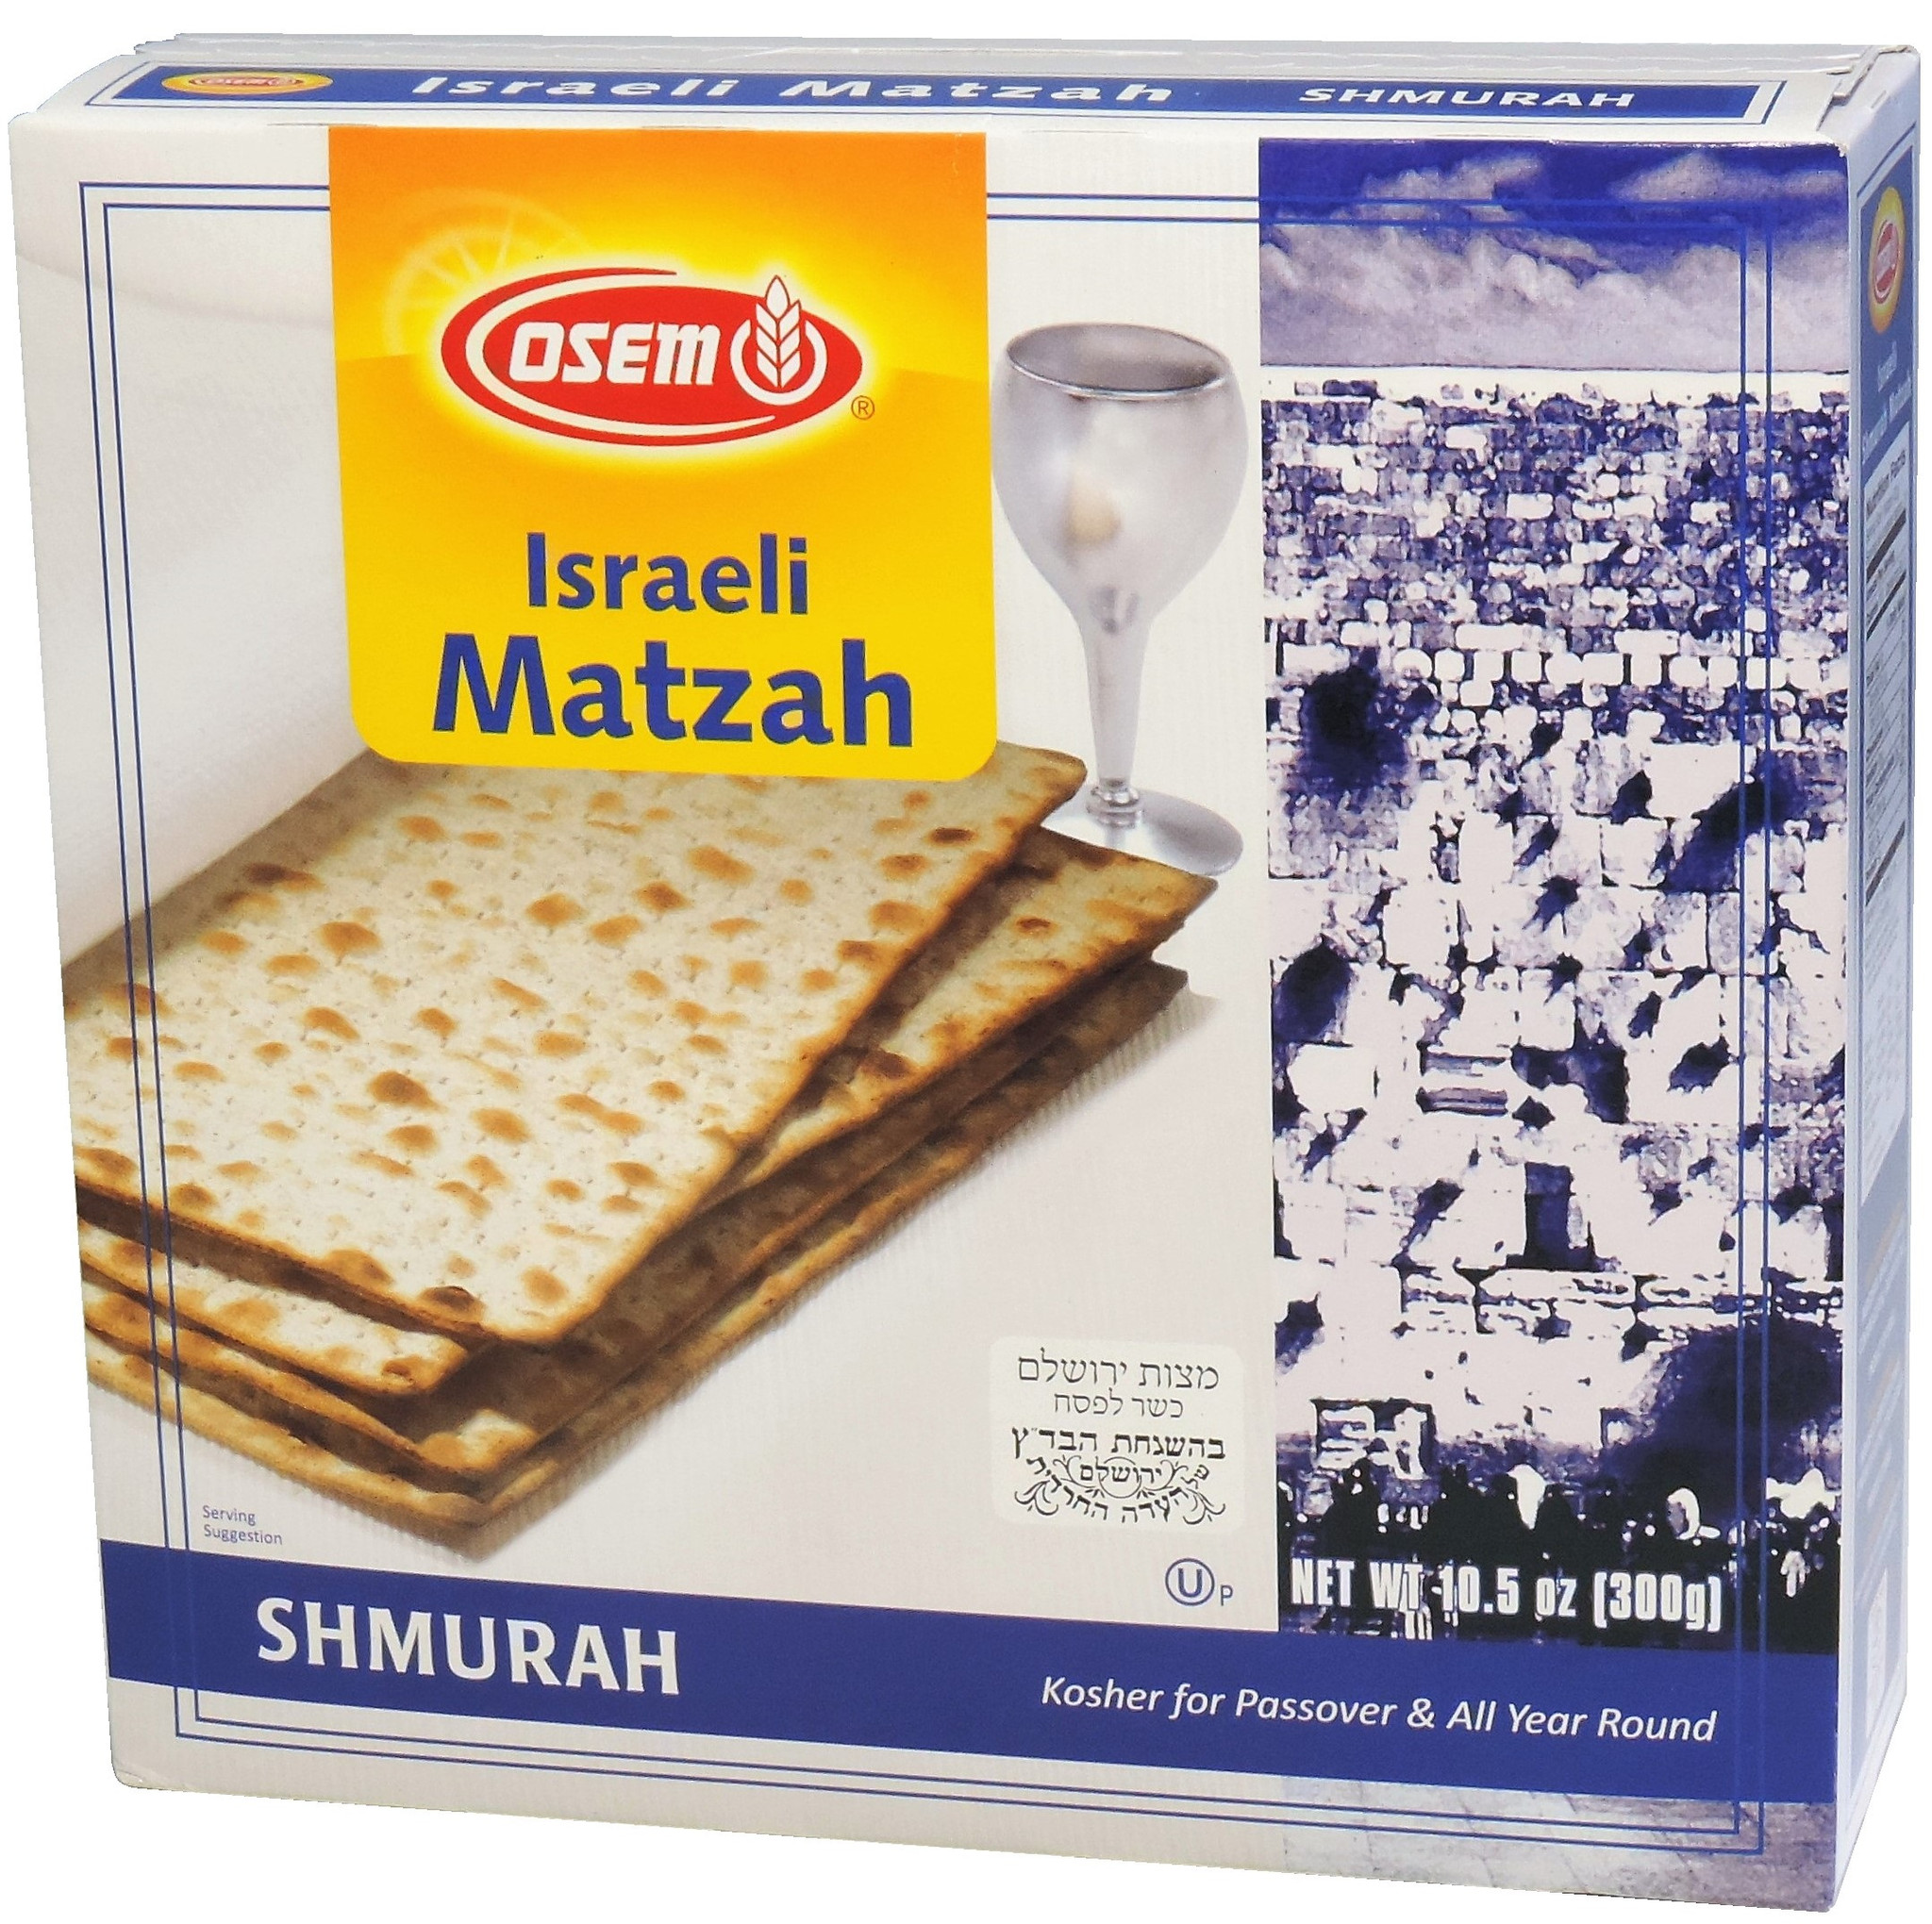 Osem Israeli Matzah Shmurah